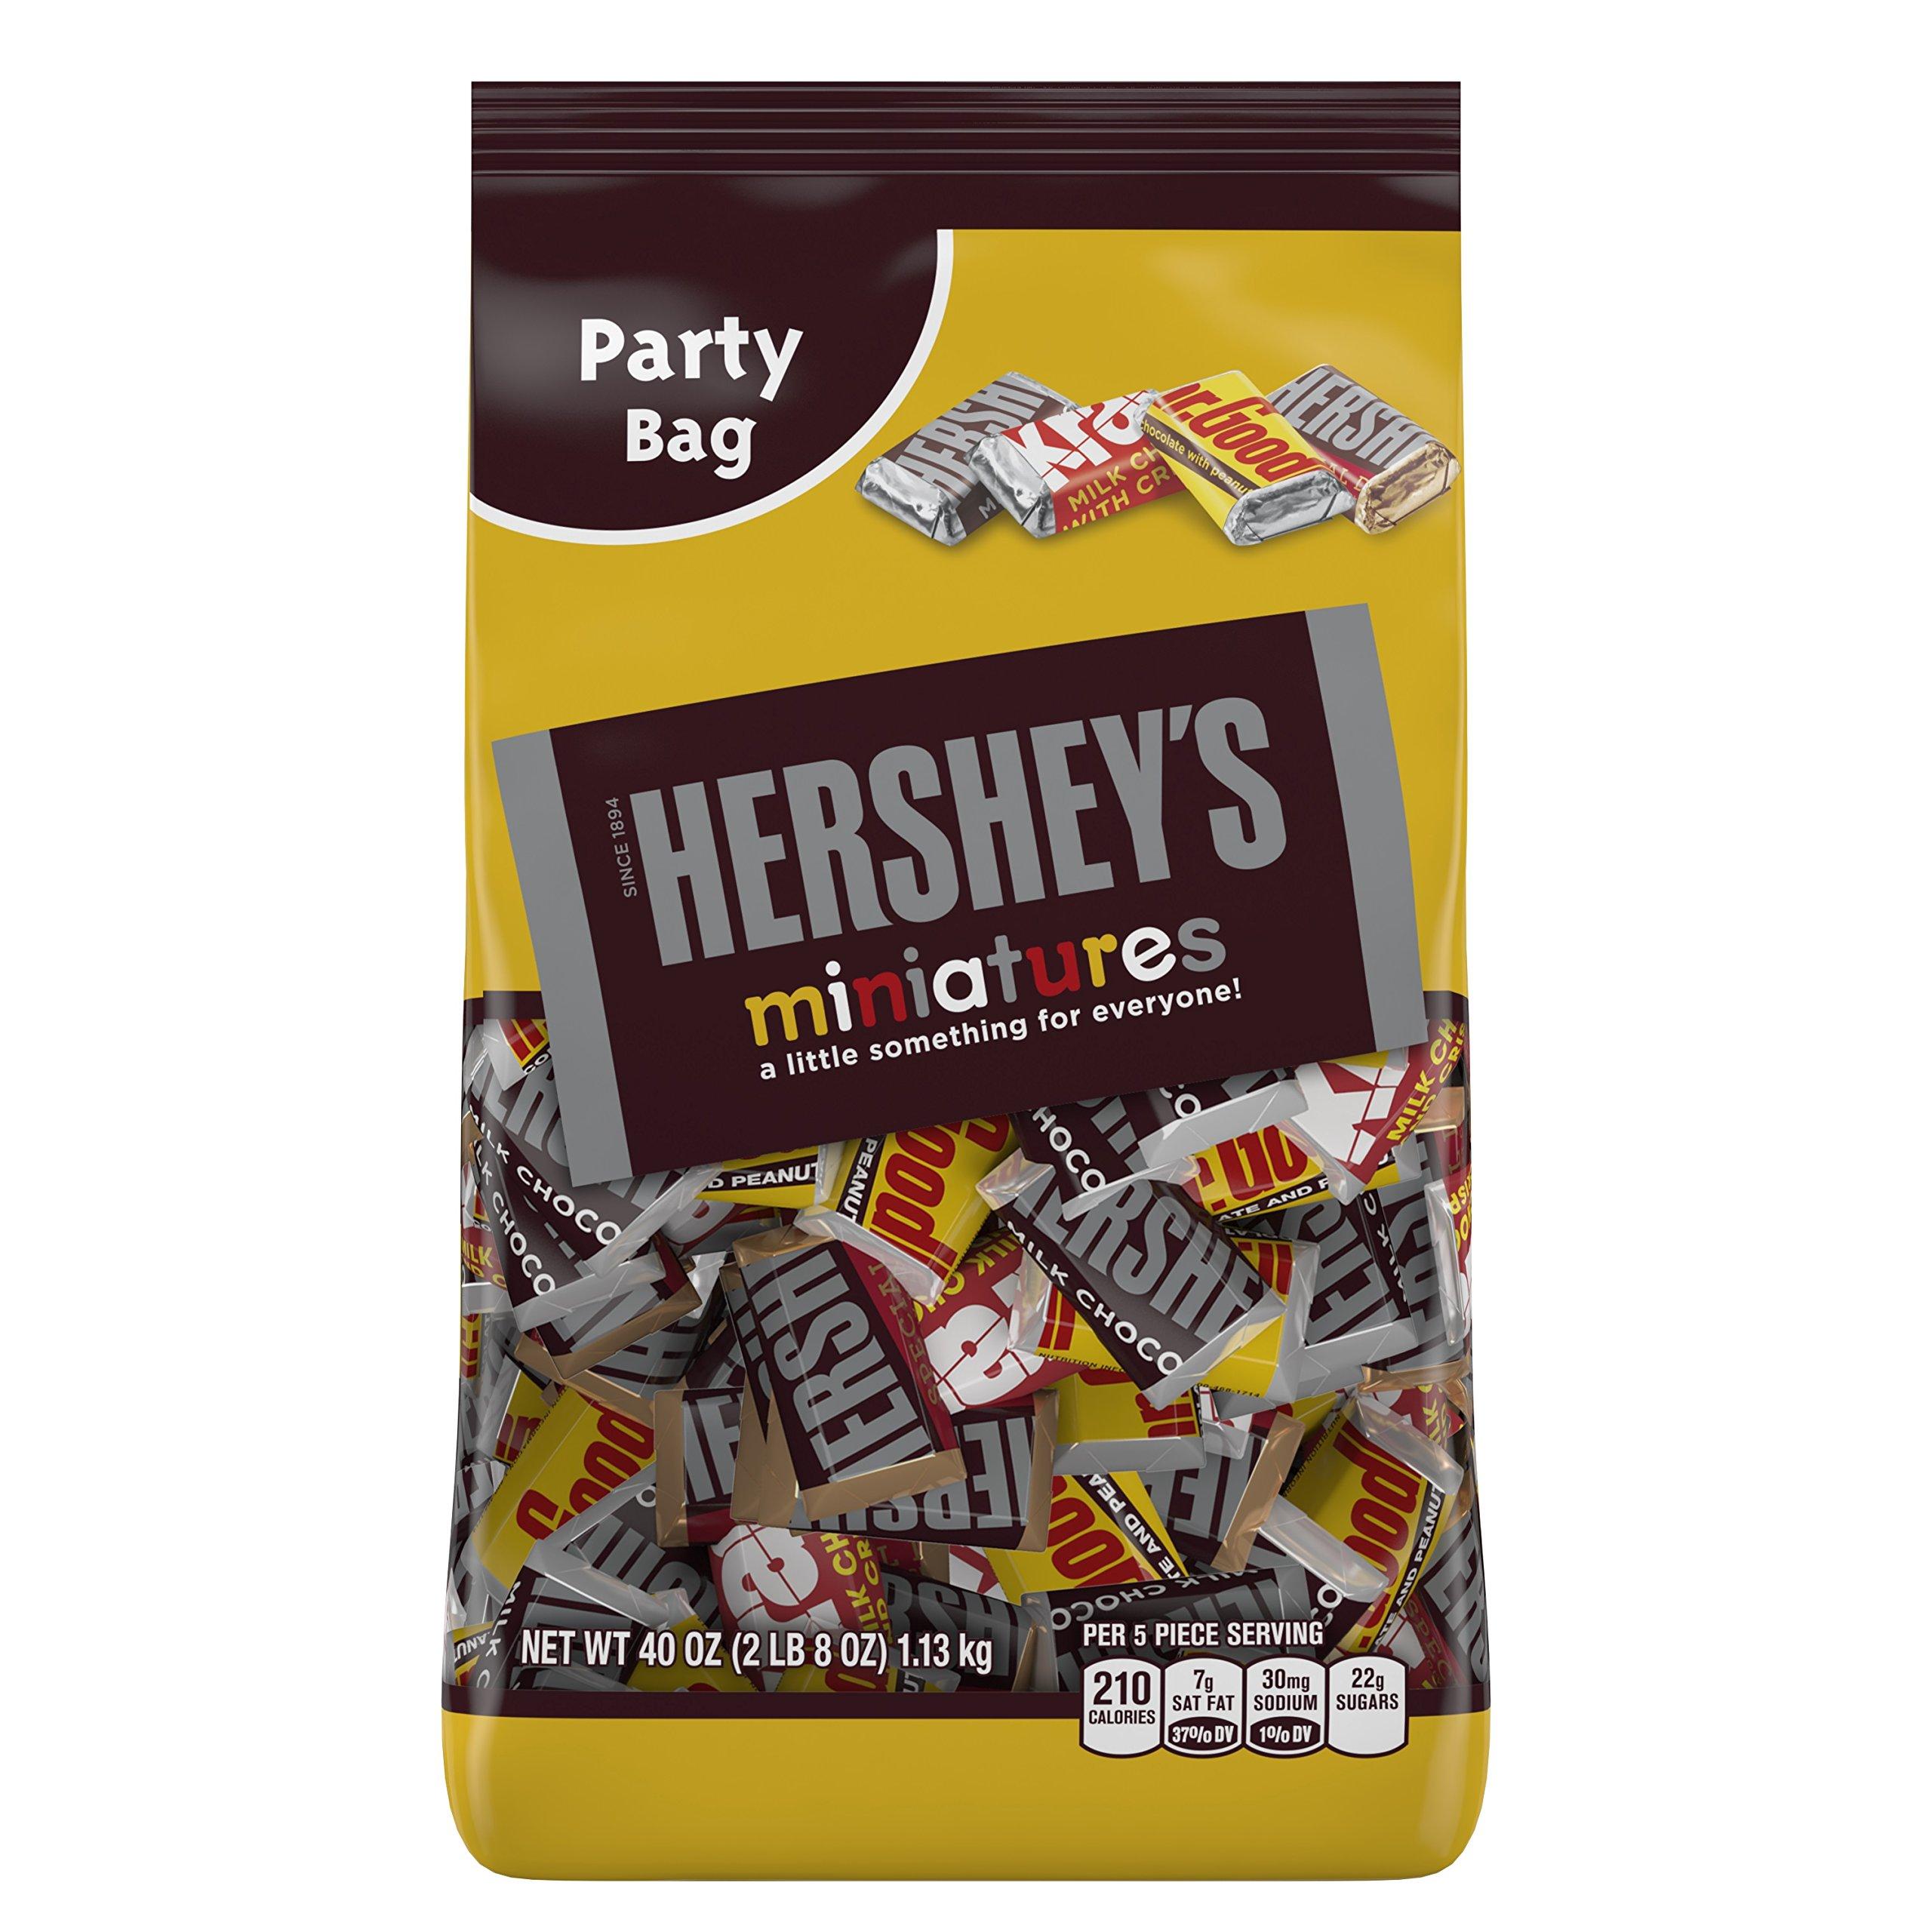 HERSHEY'S Miniatures Assortment (HERSHEY'S Milk Chocolate Bars / KRACKEL Milk Chocolate Bars / HERSHEY'S Special Dark Mildly Sweet Chocolate Bars / MR. GOODBAR Milk Chocolate Bars), 40 Ounce Bag